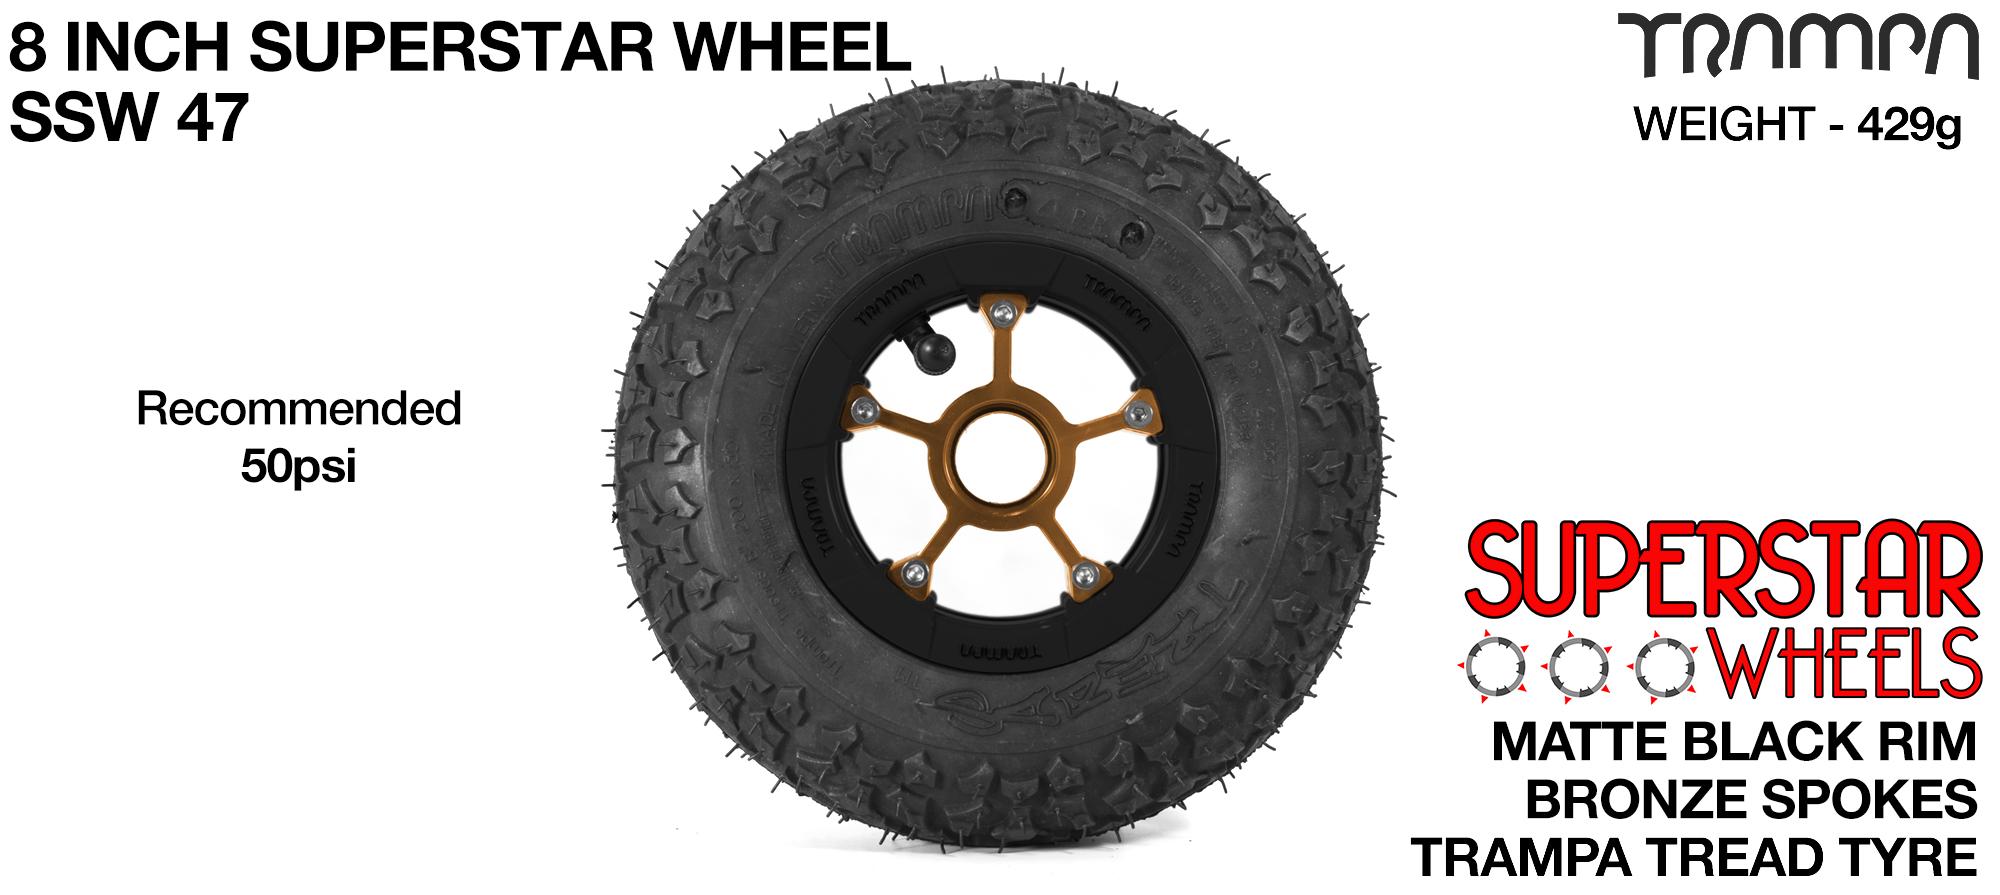 Superstar 8 inch wheel - Matt Black Rim with Bronze Anodised spokes & TRAMPA TREAD 8 Inch Tyres